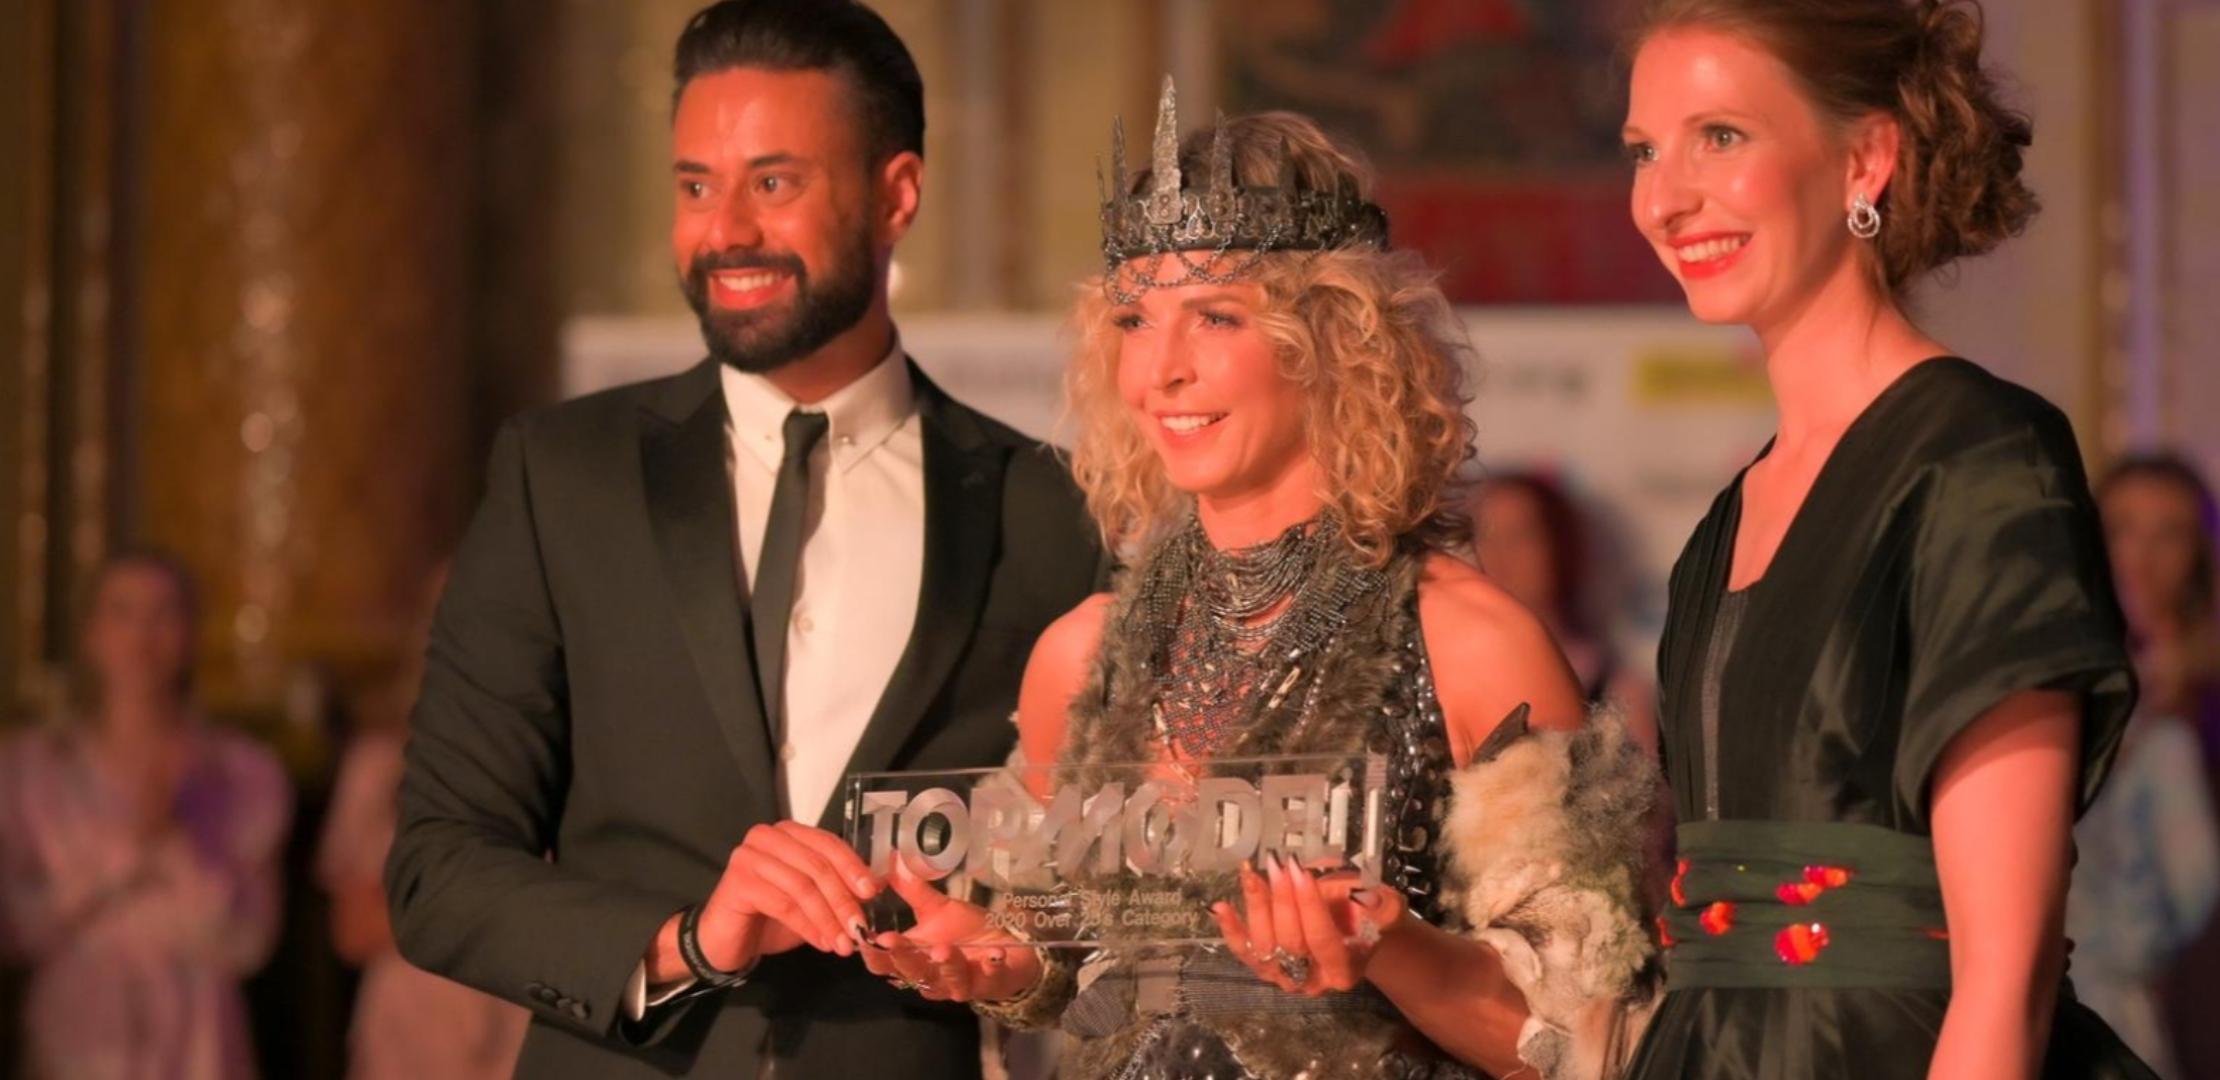 Tamara Kramer Top Model Finalist & Award Winner